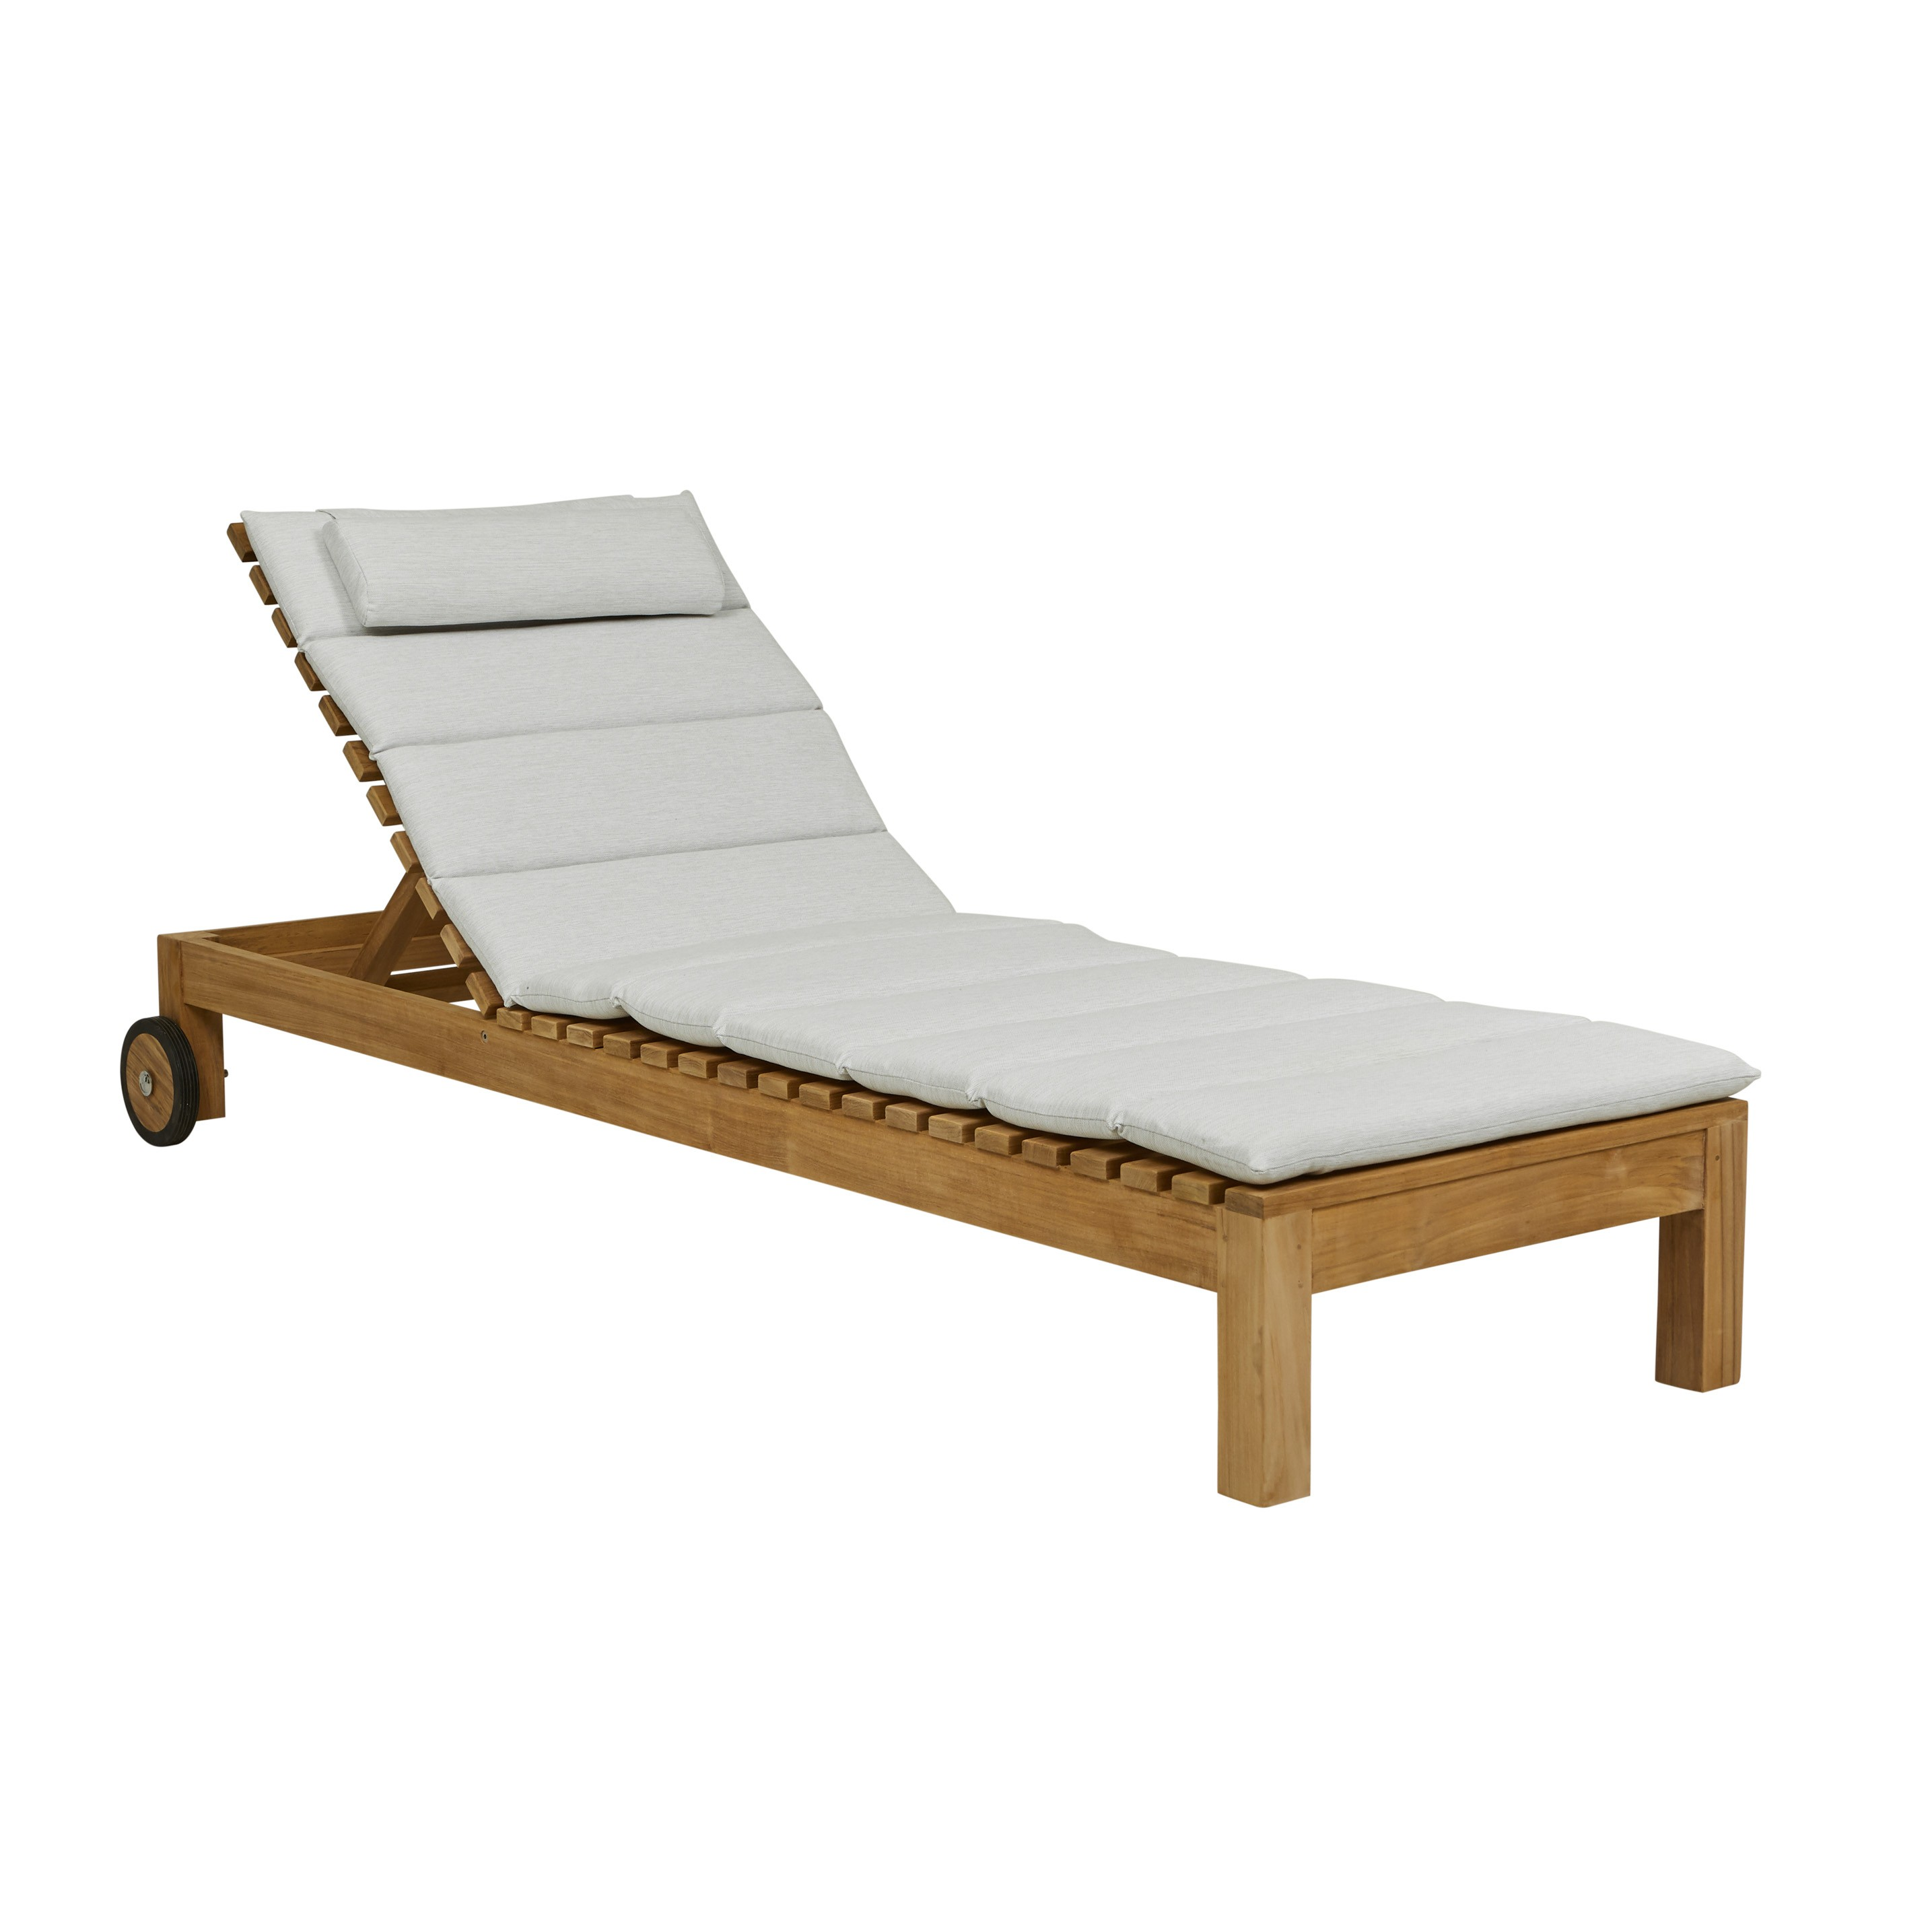 Furniture Hero-Images Sunbeds-and-Daybeds sonoma-tufted-sunbed-01